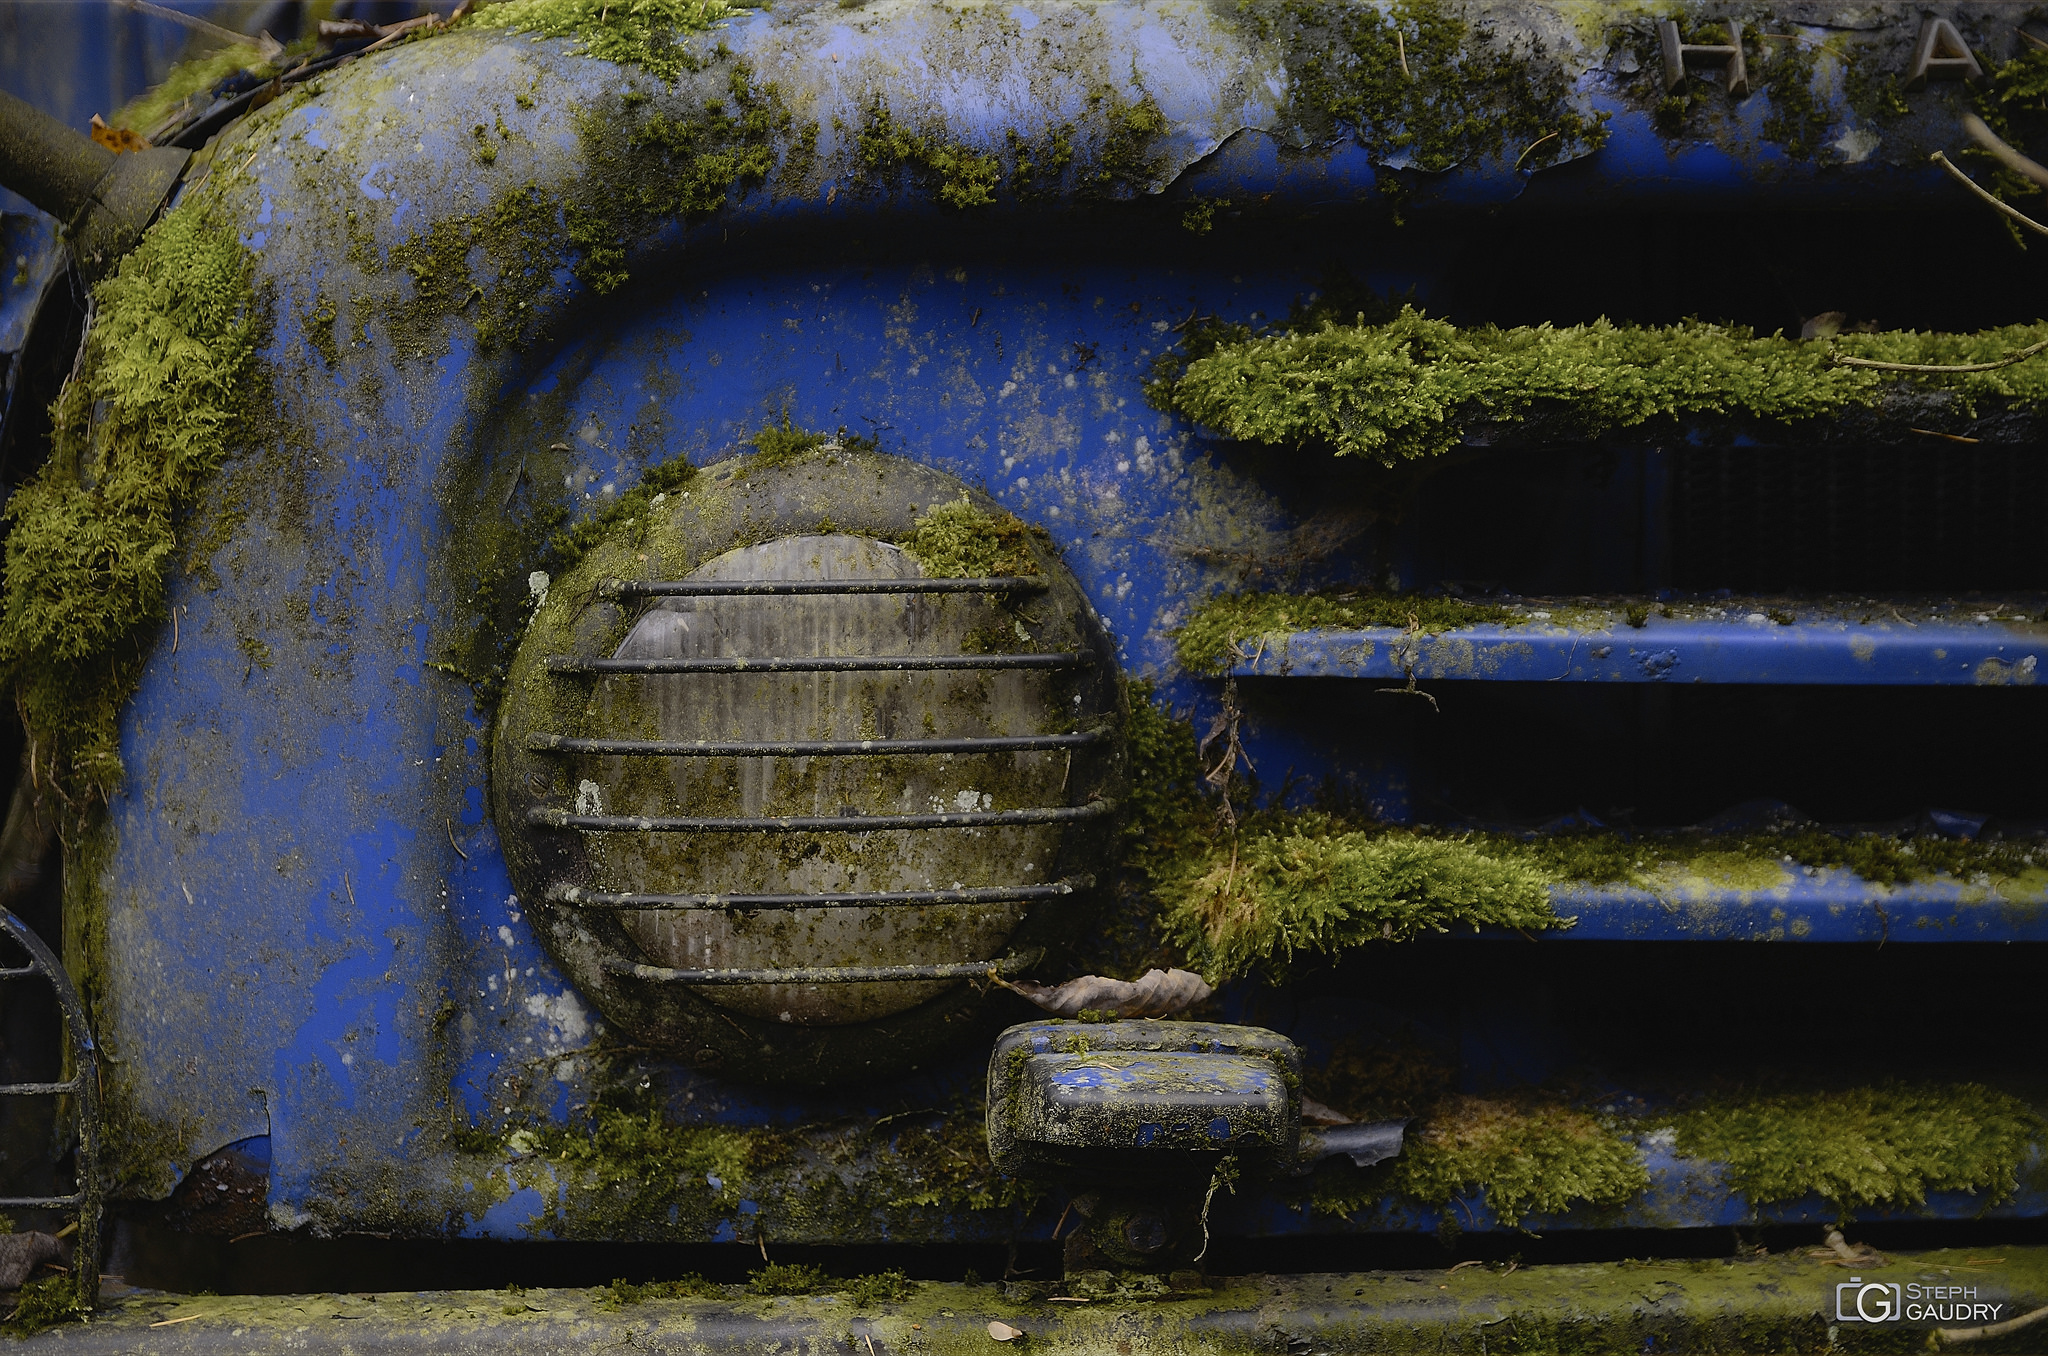 Monstroplante bleu [Click to start slideshow]